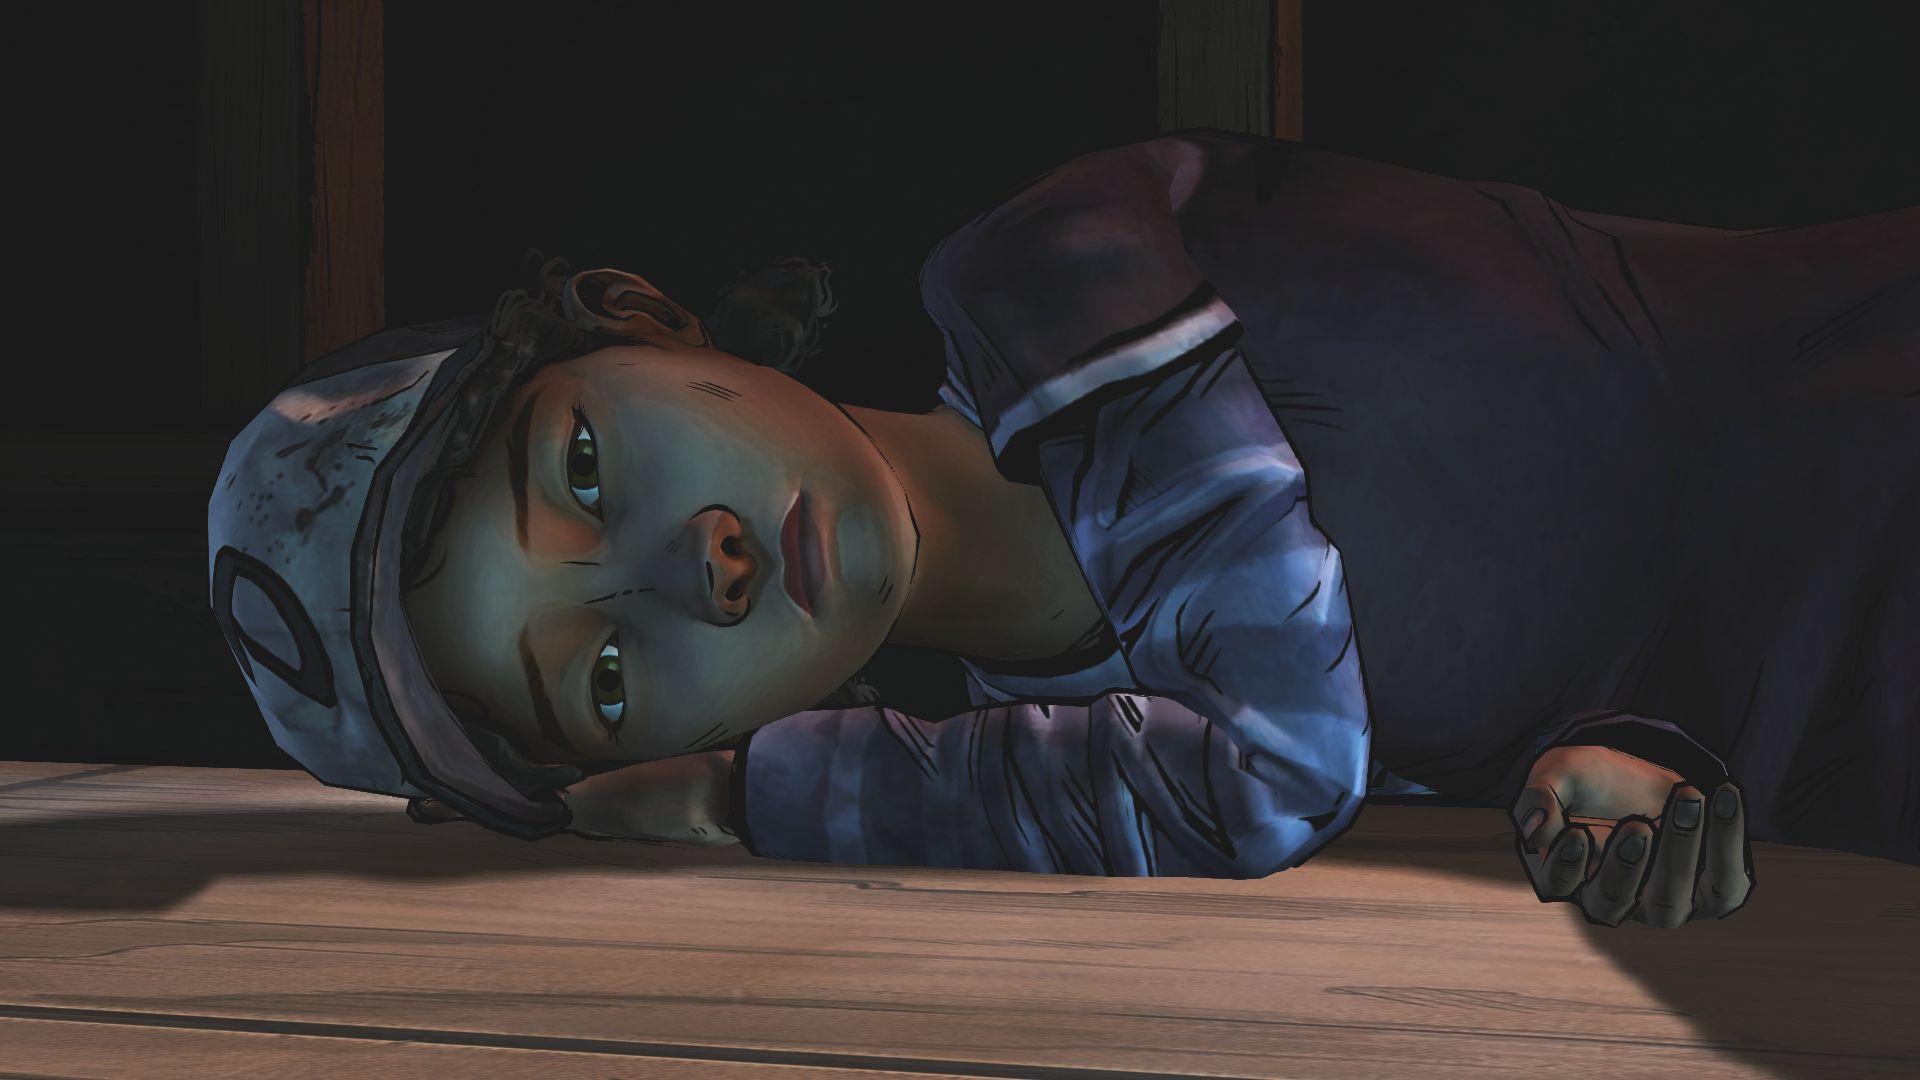 The_Walking_Dead_Season_2_Special_01-pc-games.jpg